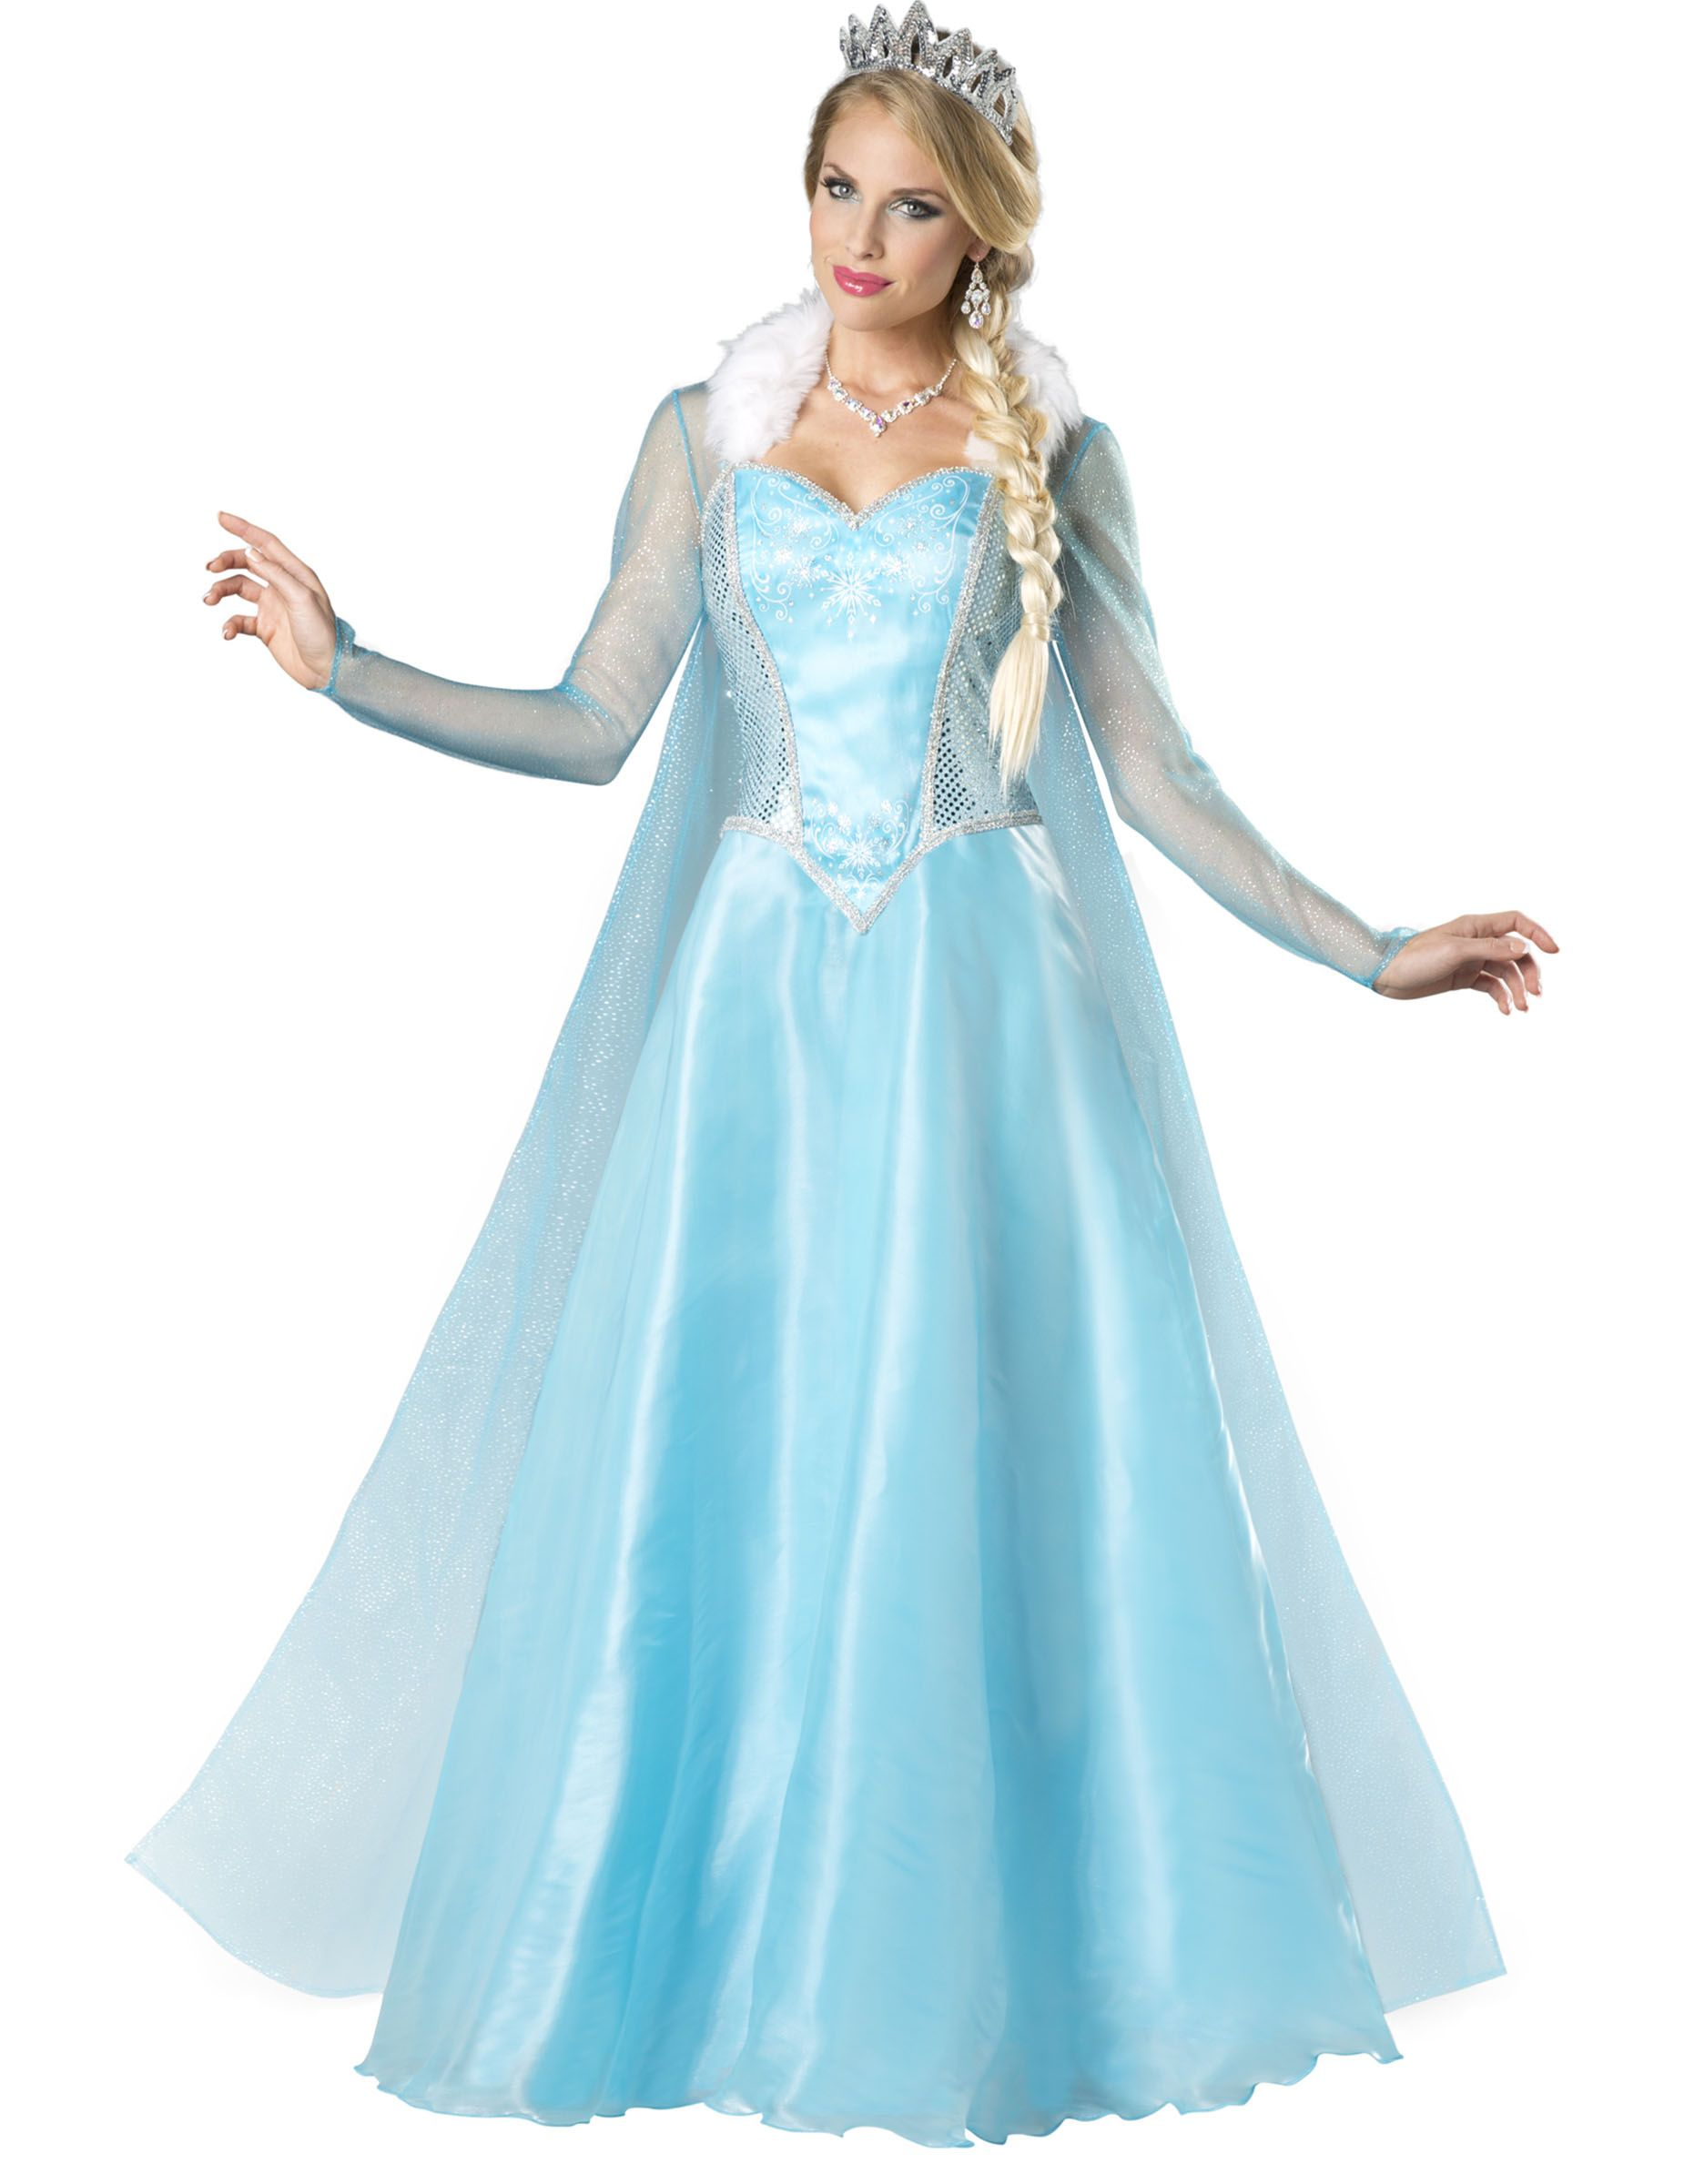 Disfraz de reina del hielo para mujer -Premium   Elsa